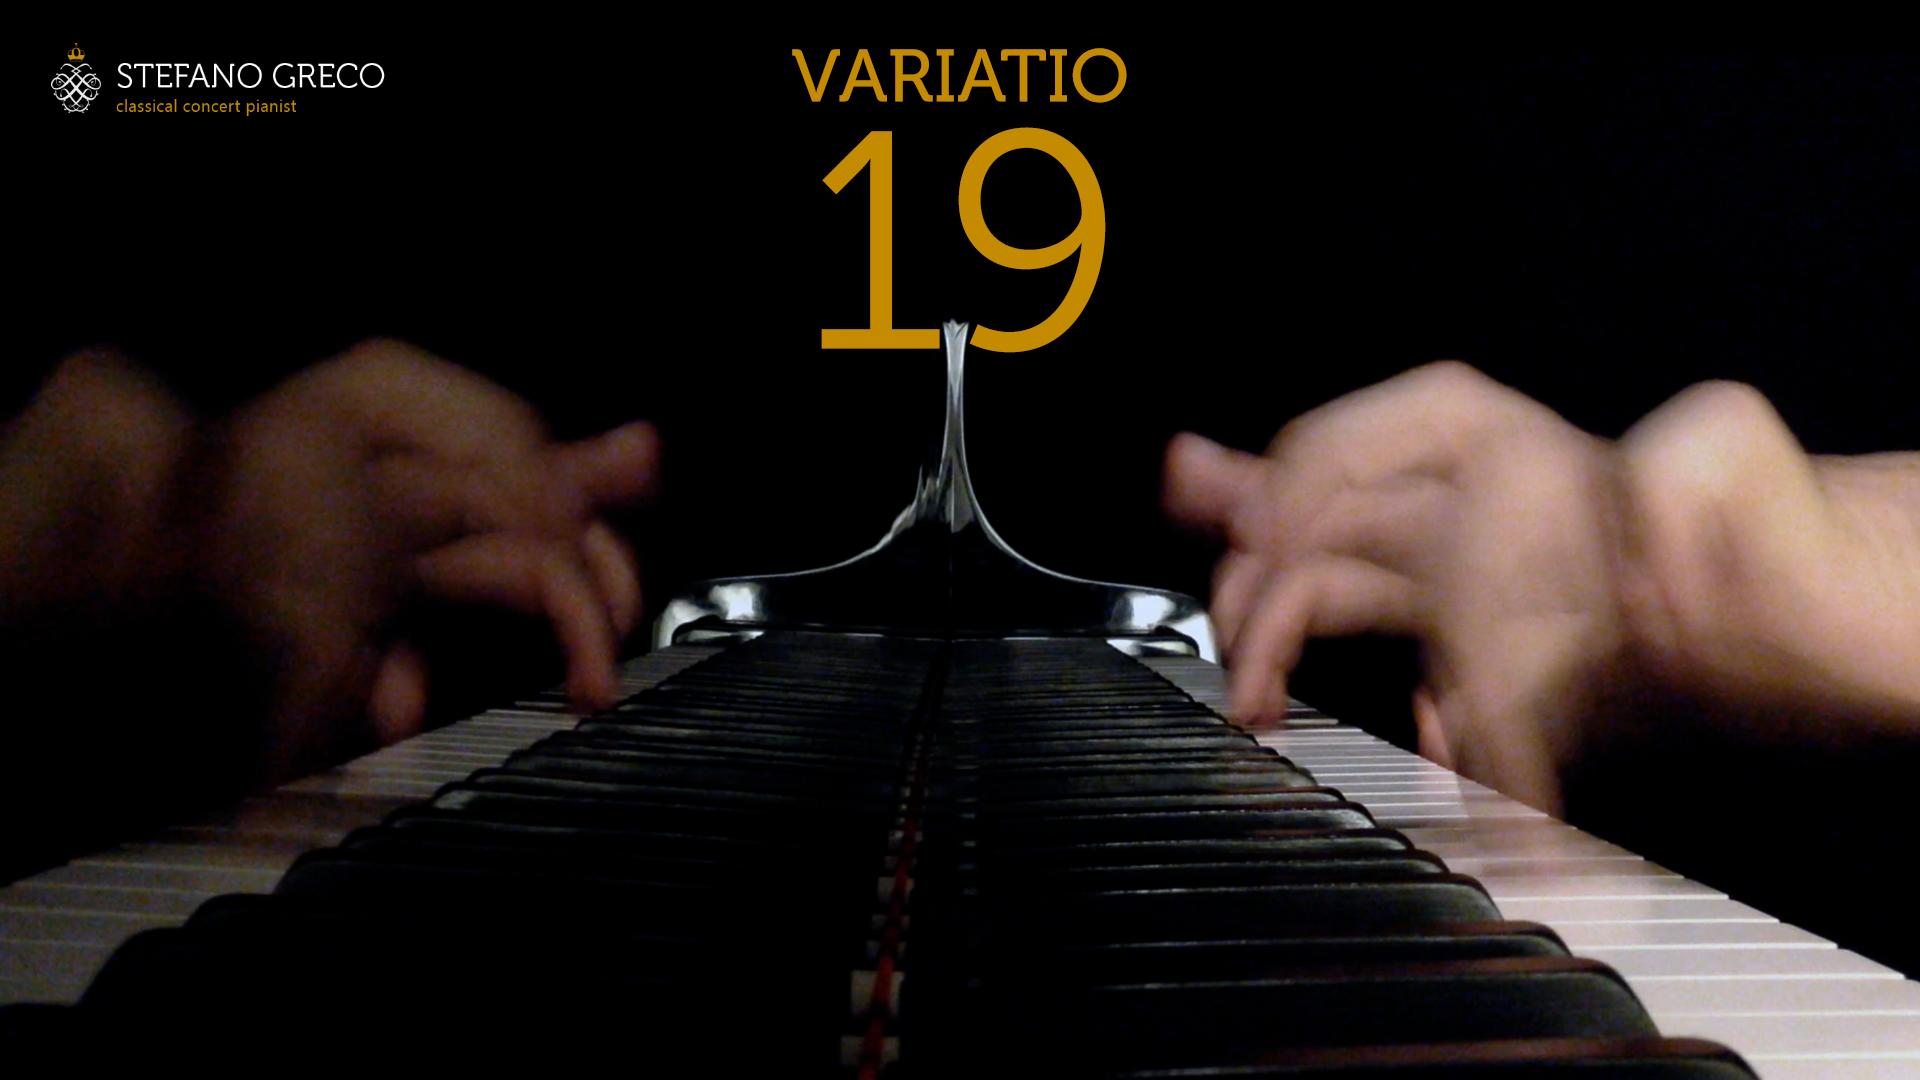 Bach. Goldberg Variations. Variatio XIX. Stefano Greco, piano